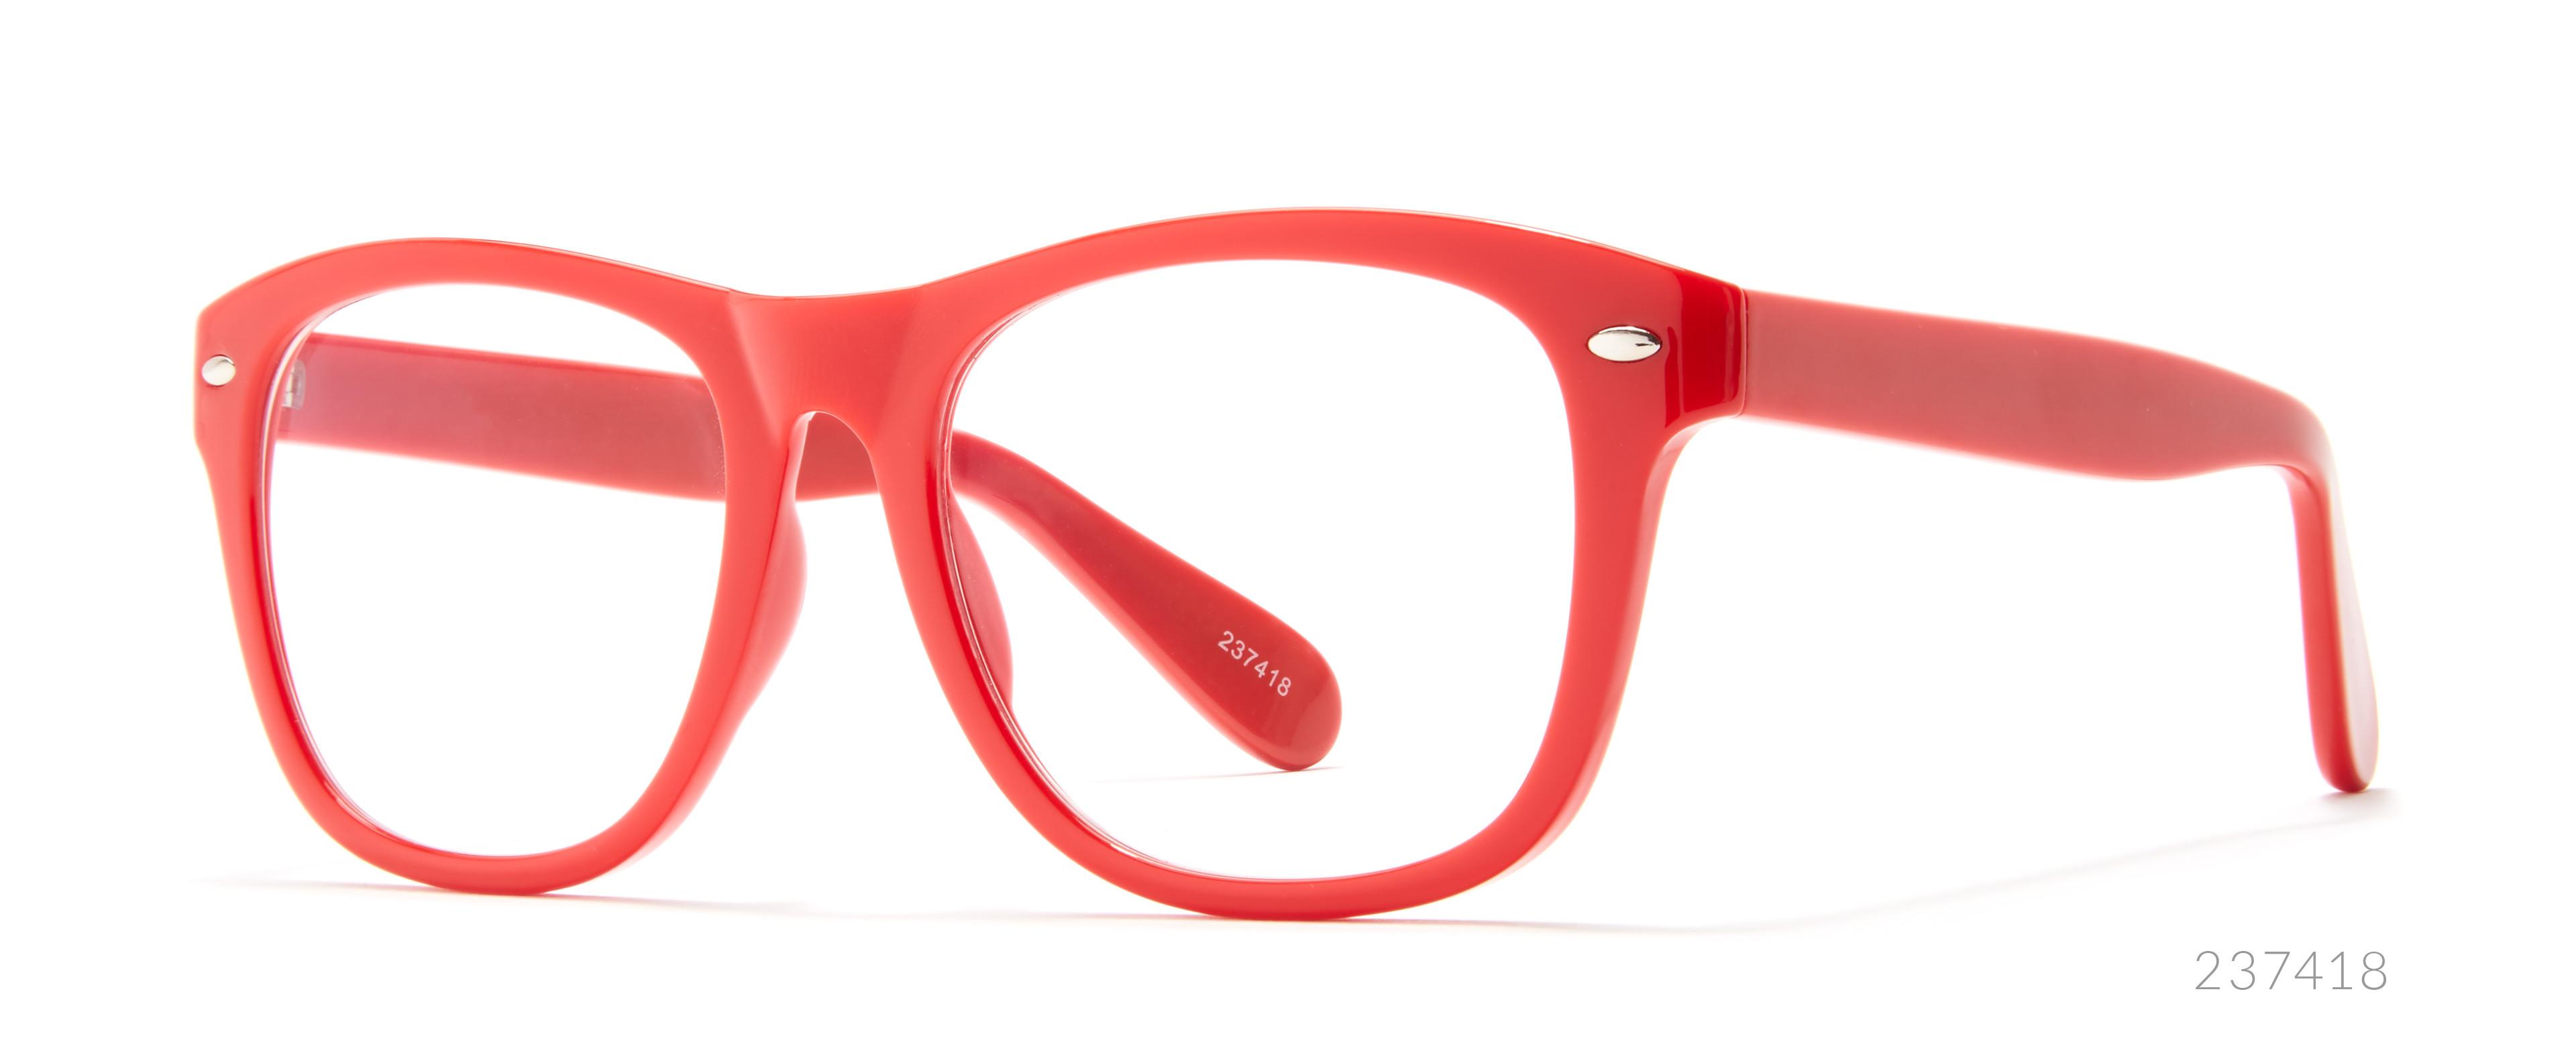 red-wedding-glasses.jpg